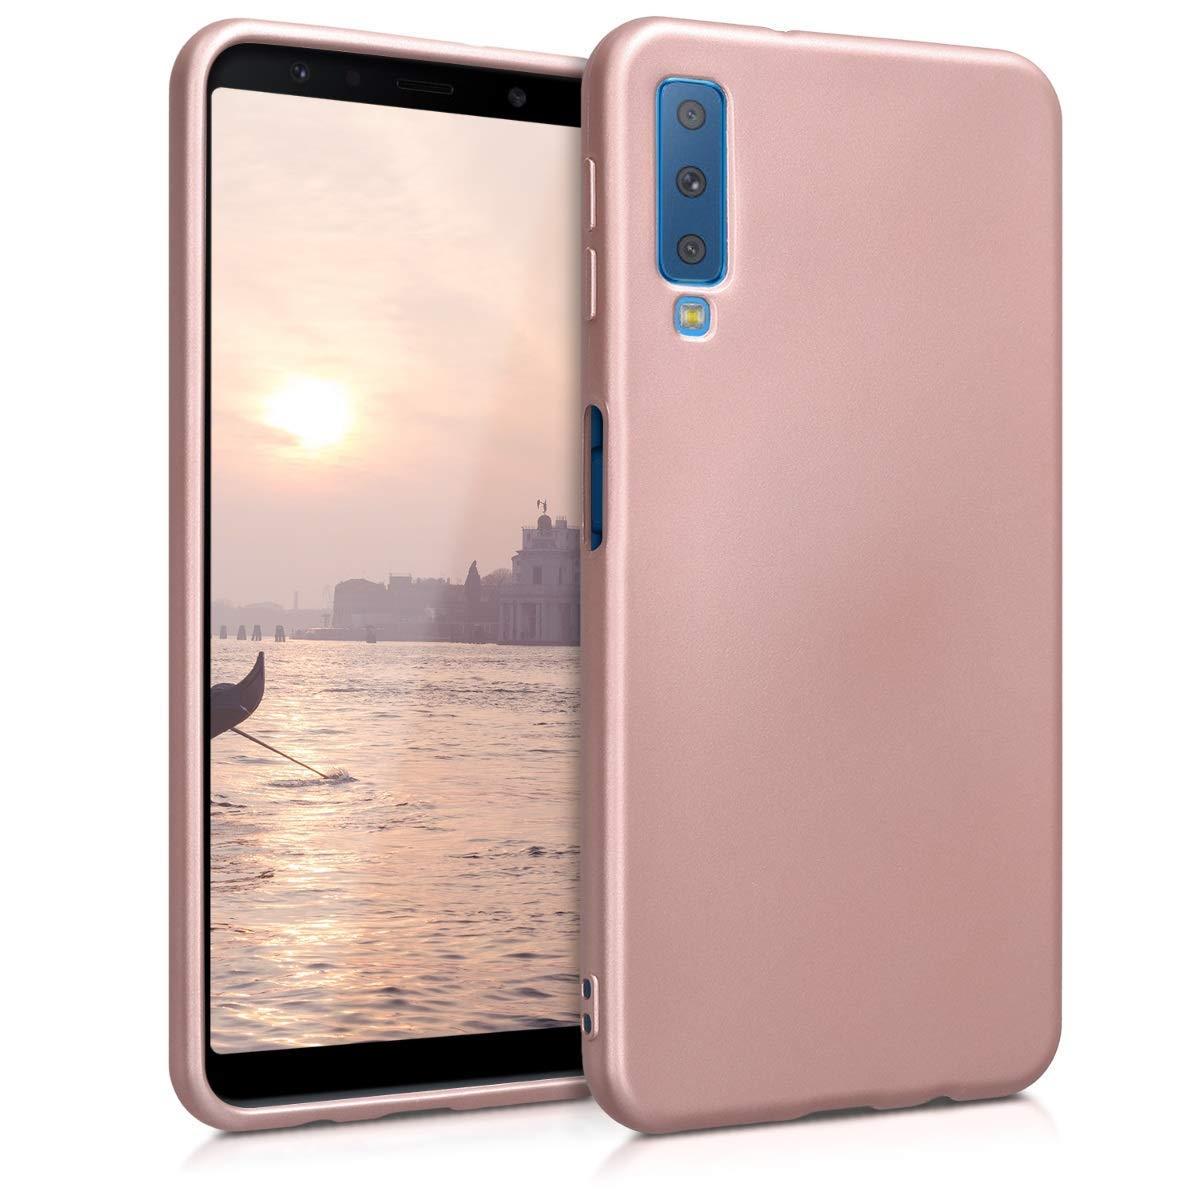 KW Θήκη Σιλικόνης Samsung Galaxy A7 2018 - Metallic Rose Gold (46421.31)